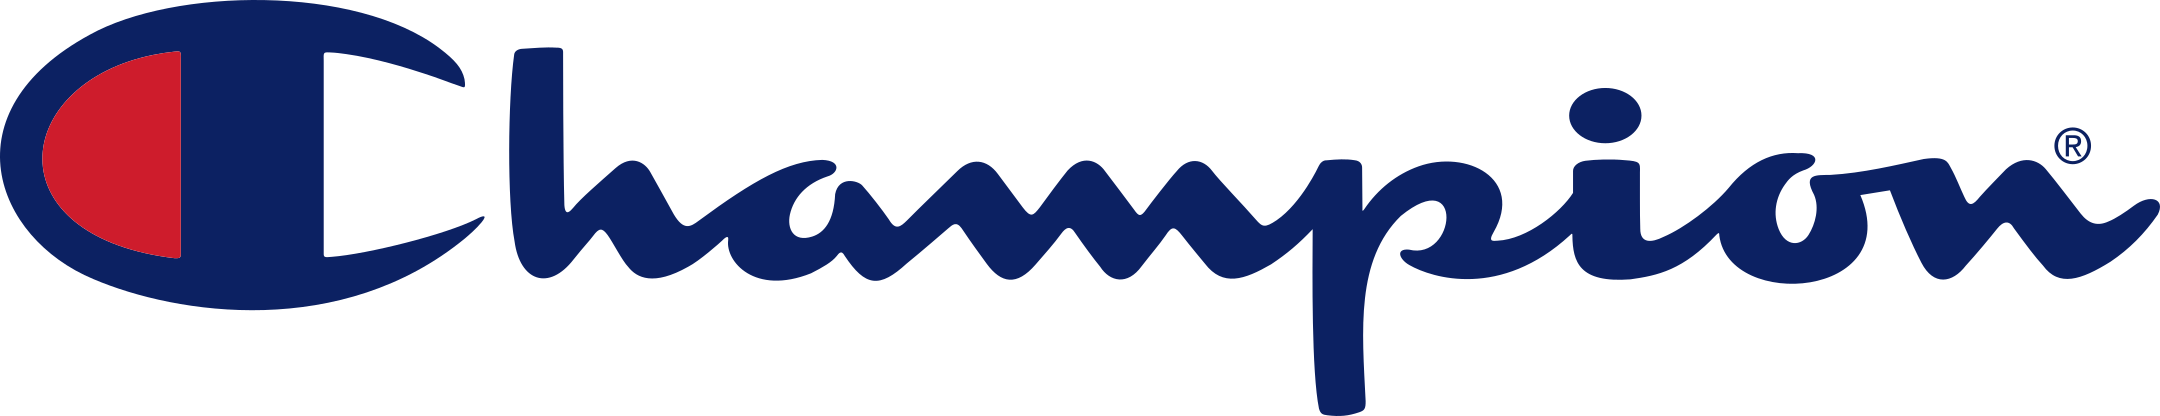 champion logo 1 - Champion Logo